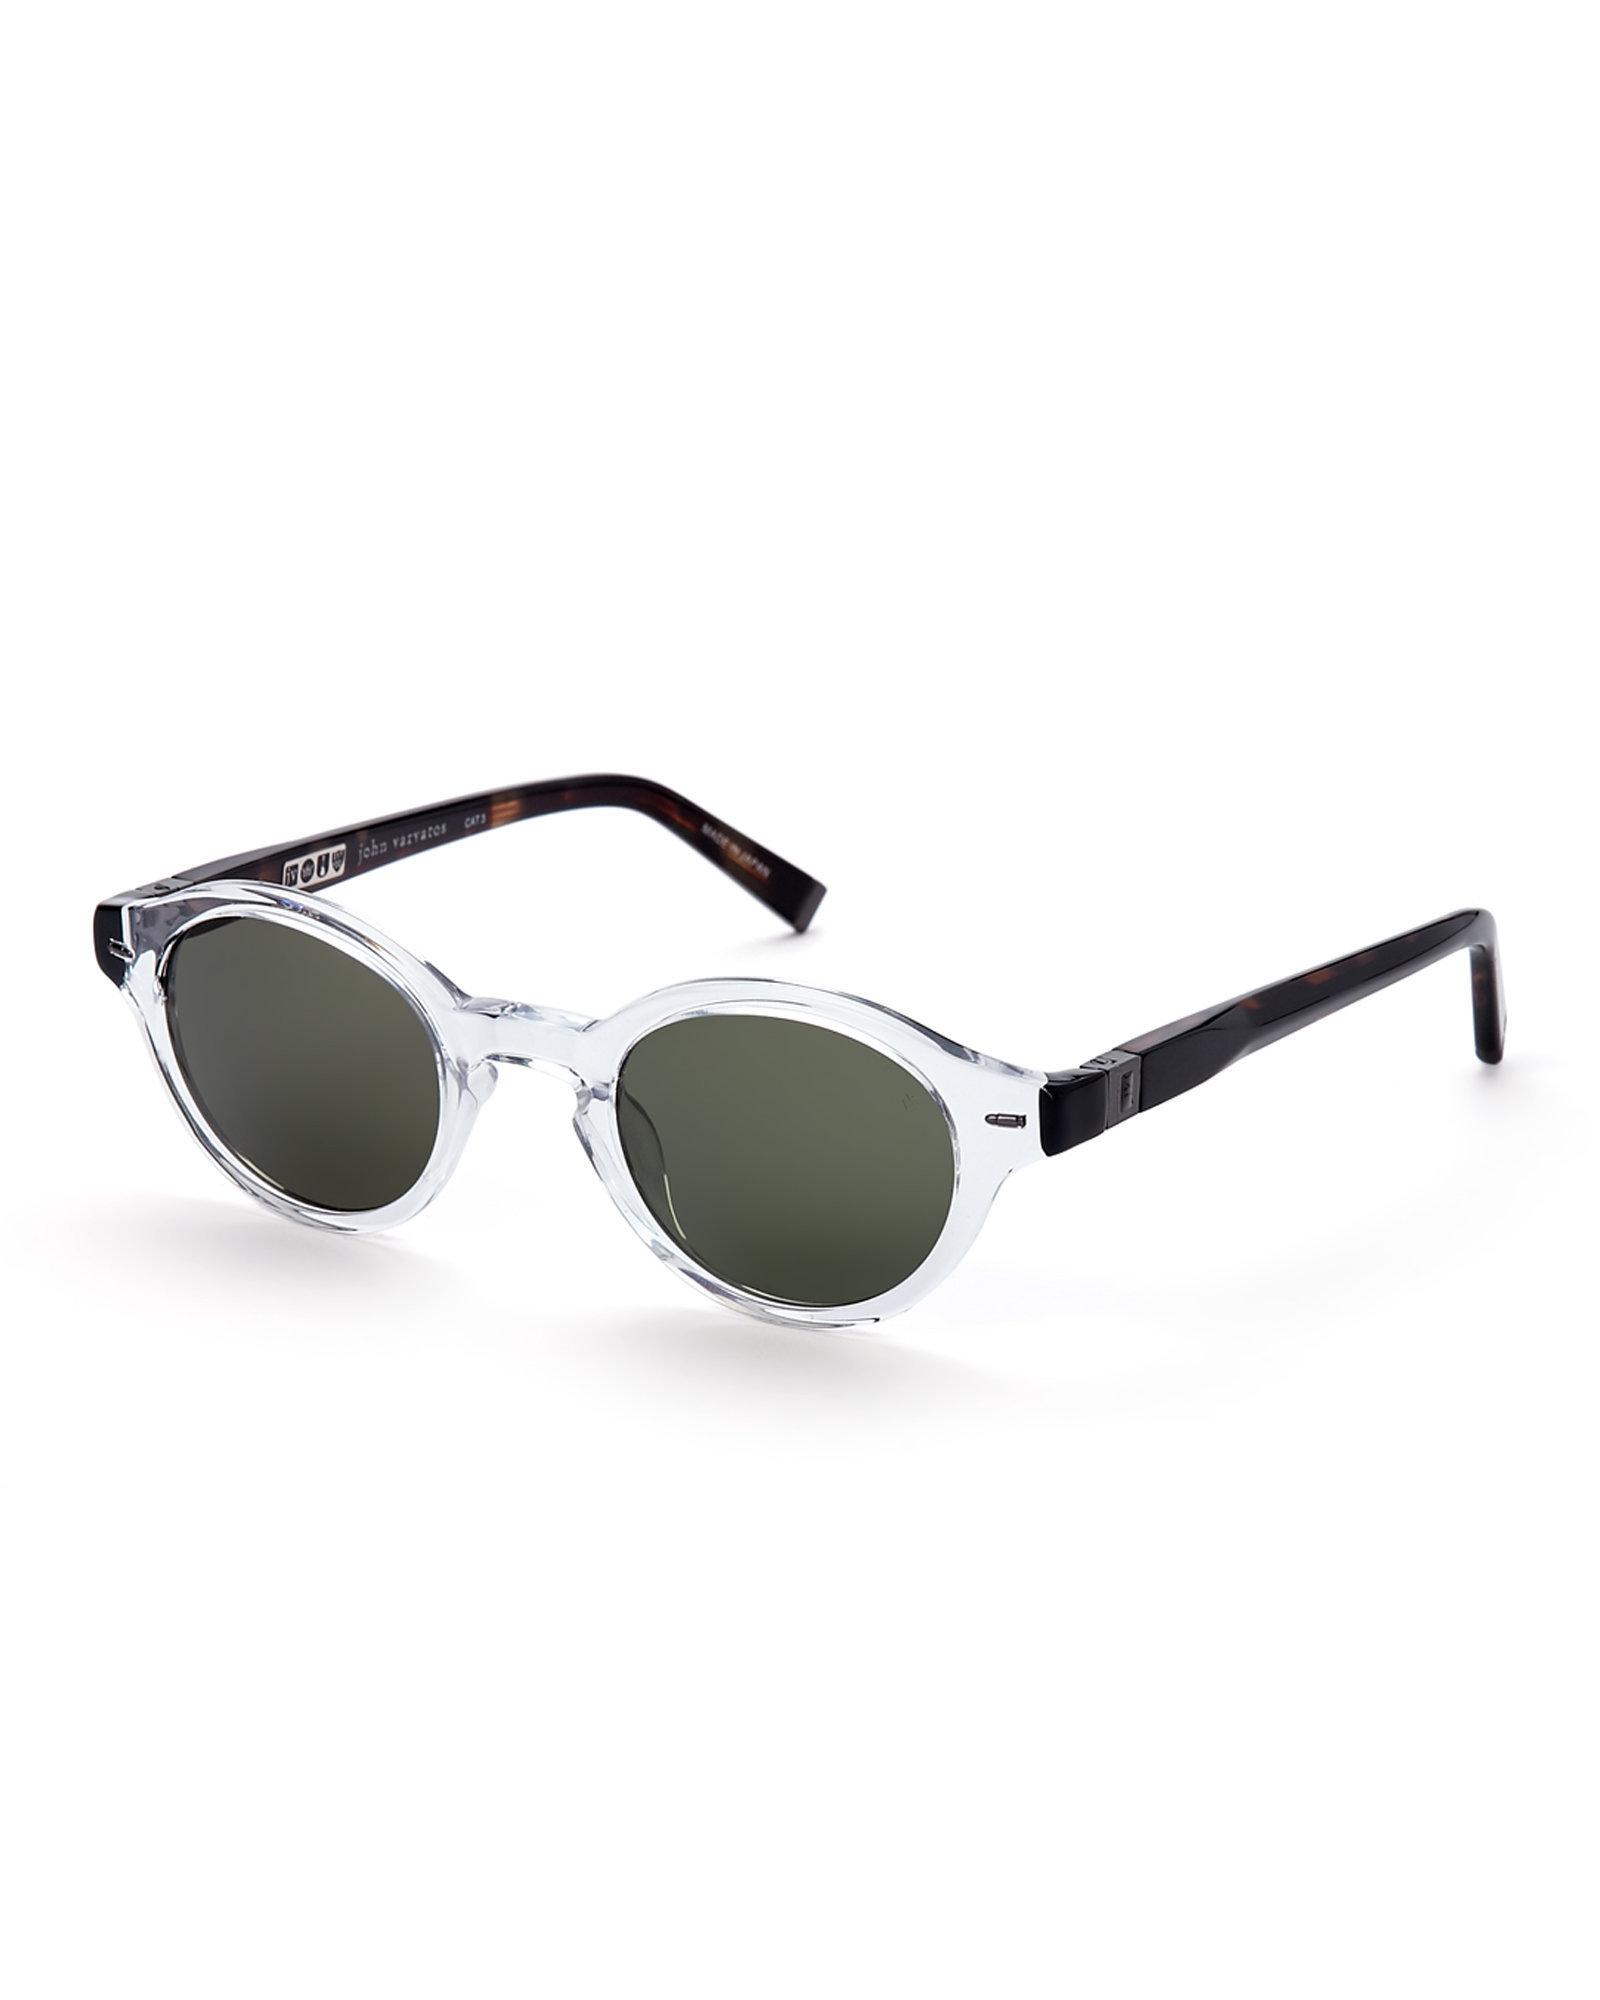 Lyst - John Varvatos V756 Retro Round Sunglasses in Black for Men